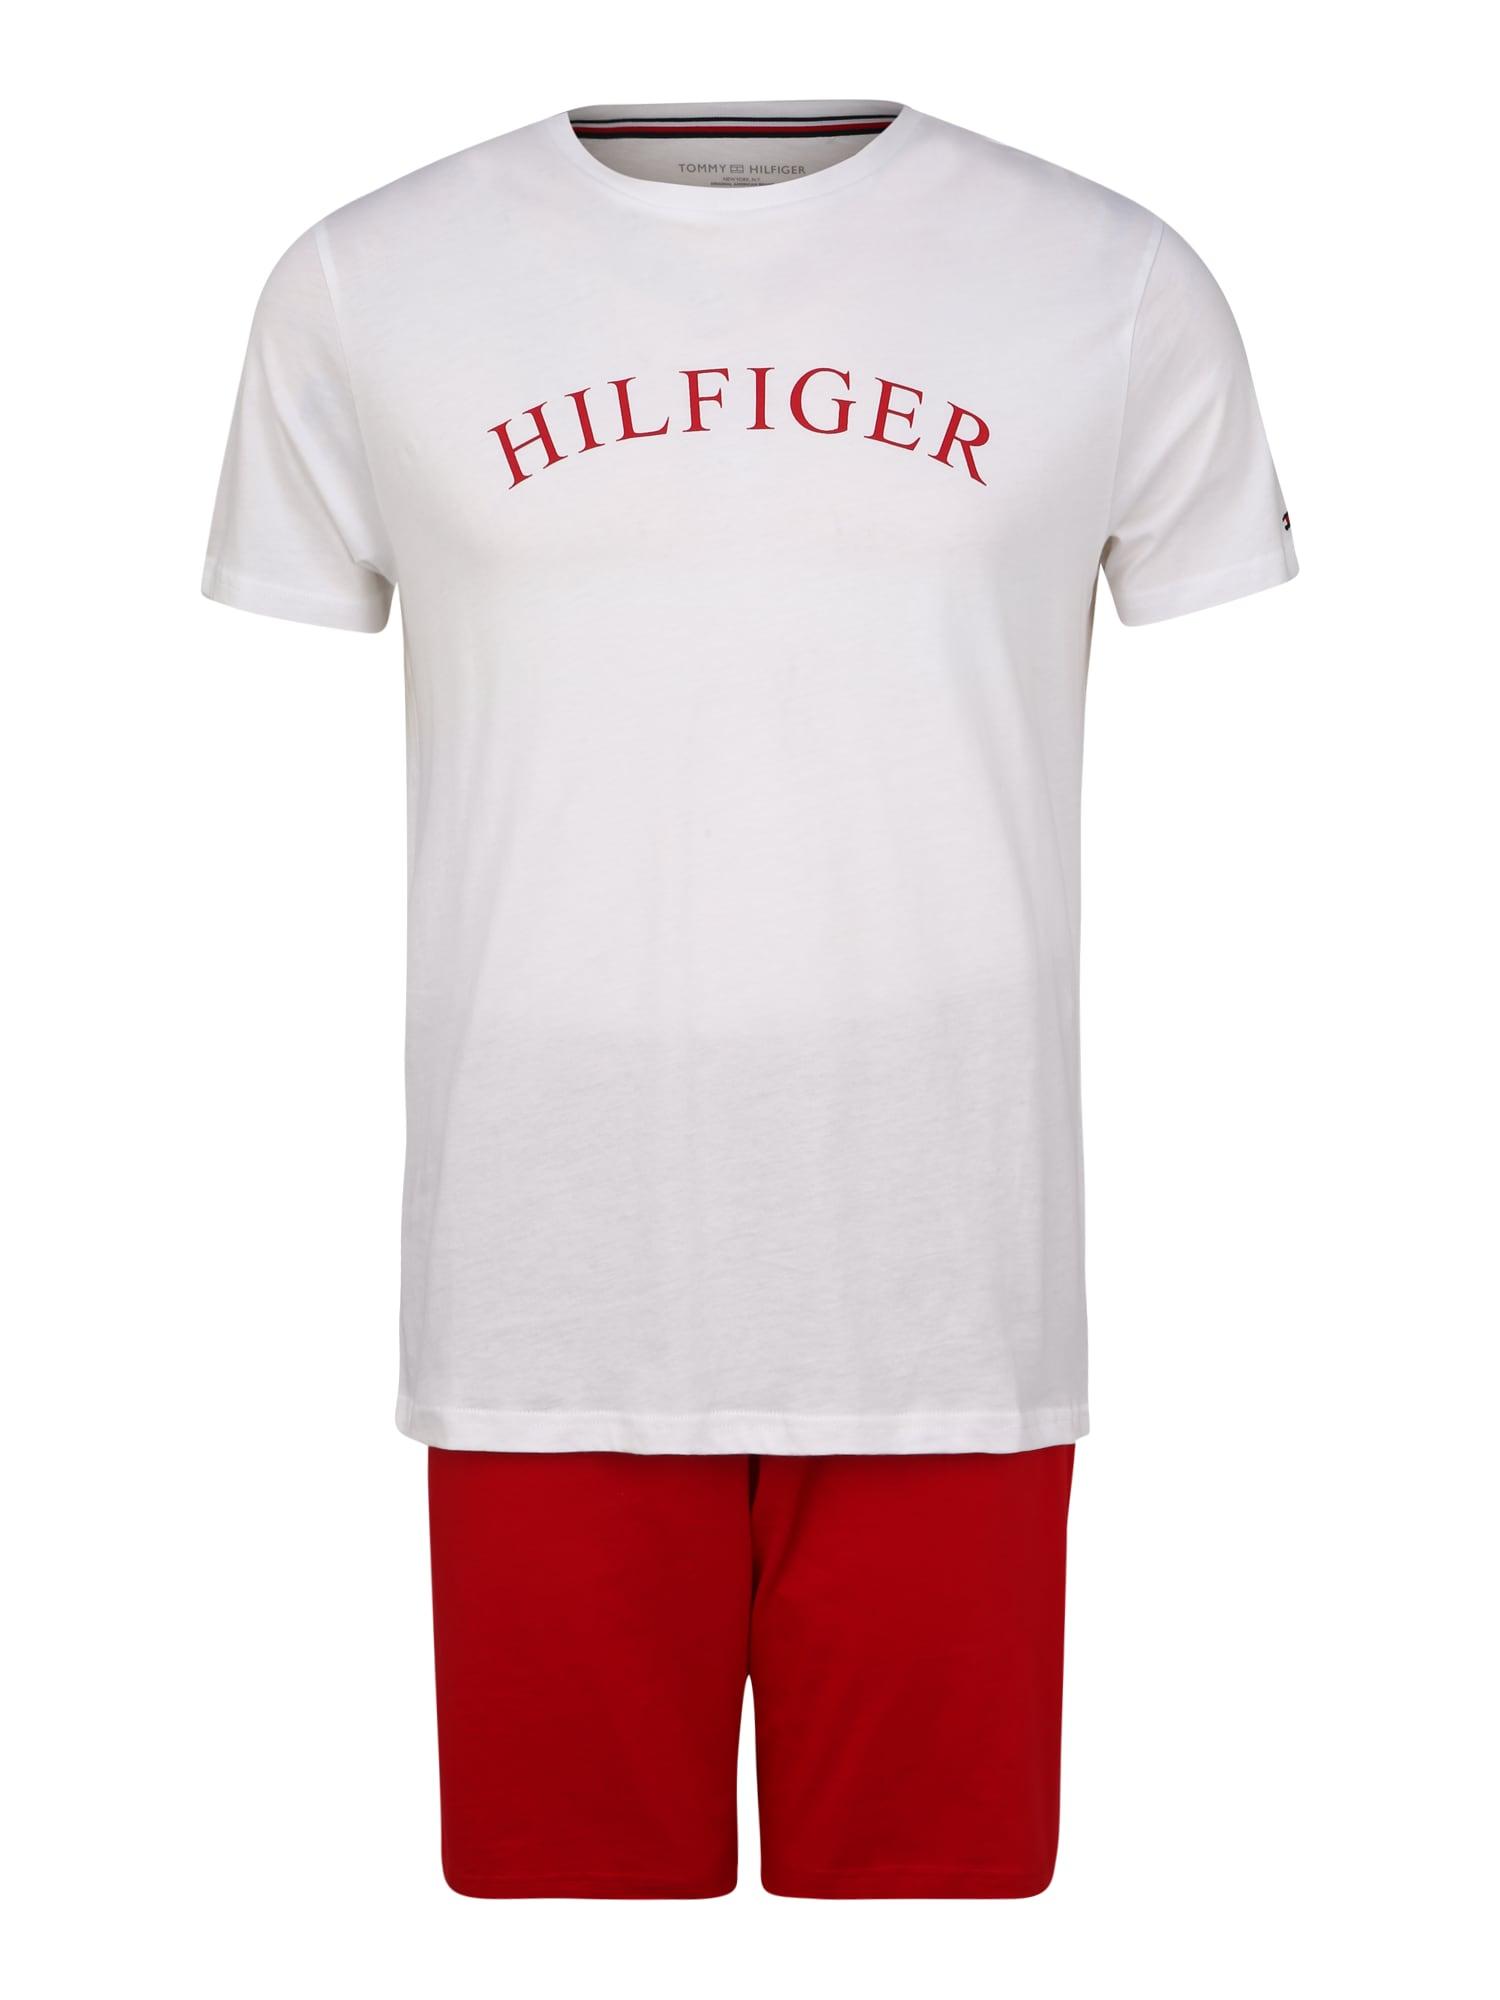 Tommy Hilfiger Underwear Trumpa pižama balta / kraujo spalva